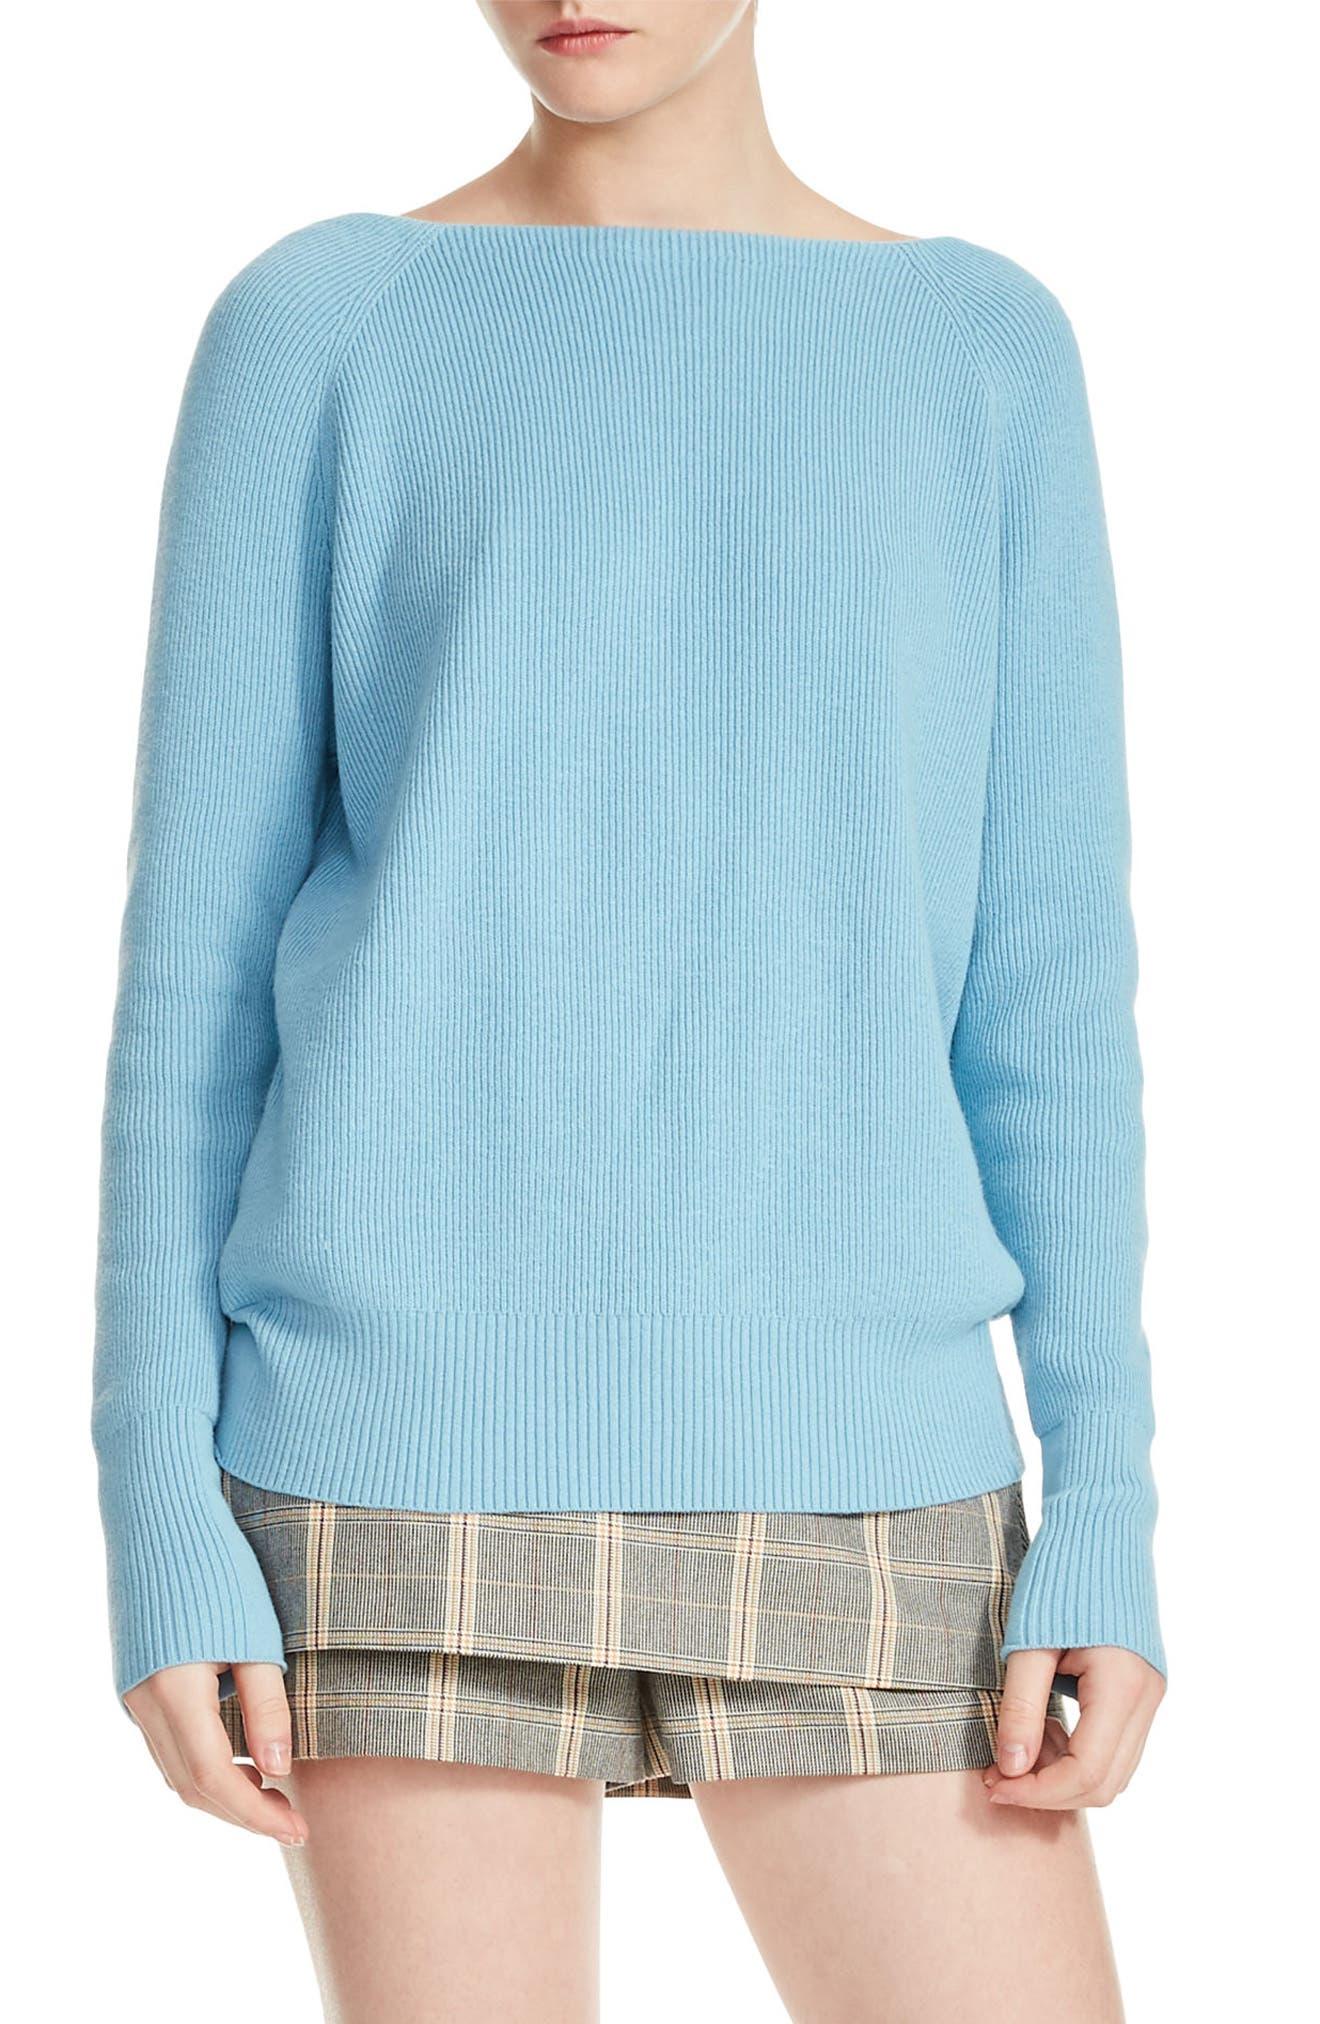 Moon Crisscross Back Rib Knit Sweater,                         Main,                         color, 400